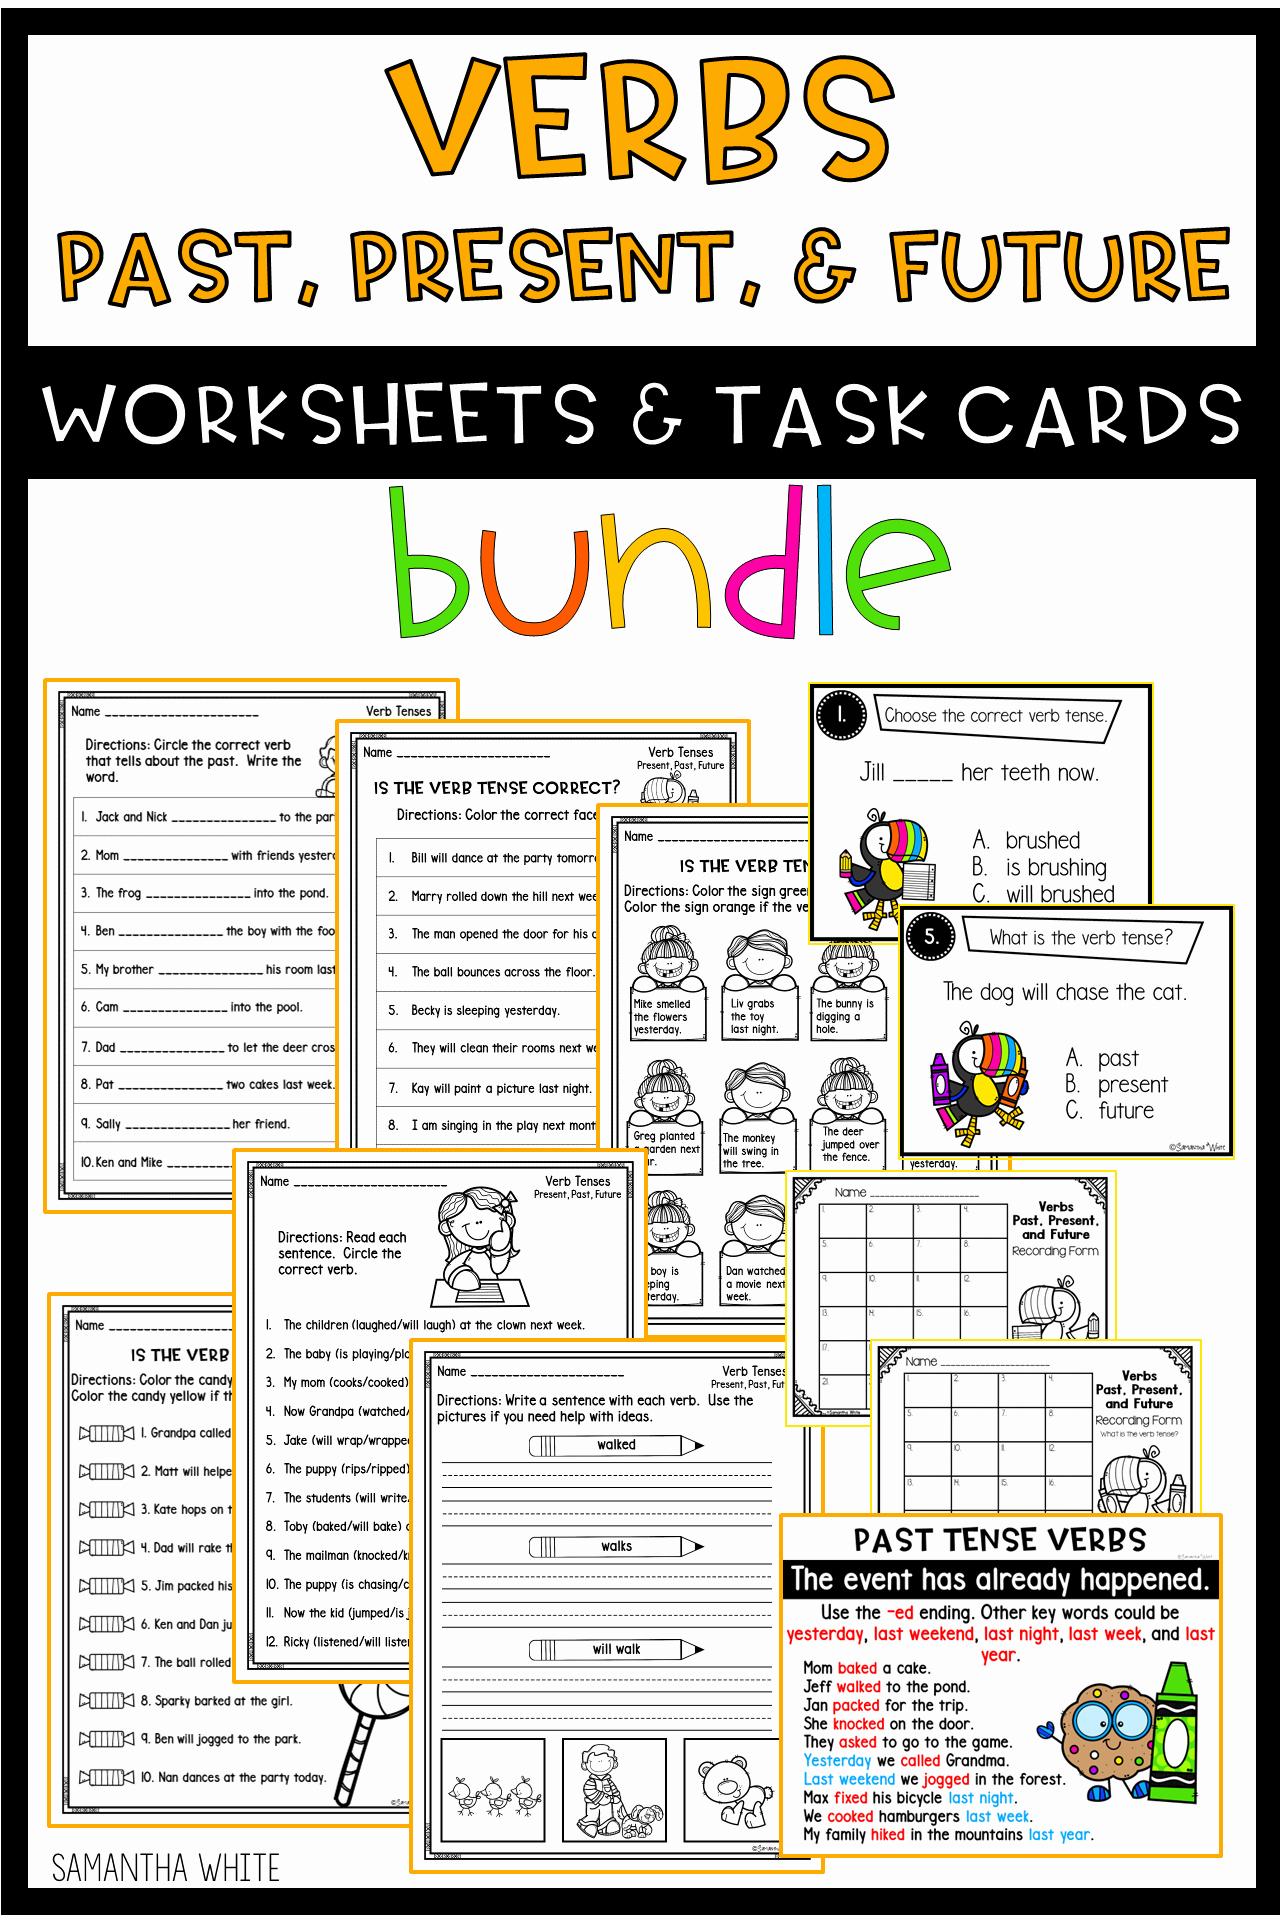 Verbs Past Present Future Worksheet Inspirational Verbs Past Present Future Worksheets & Task Cards